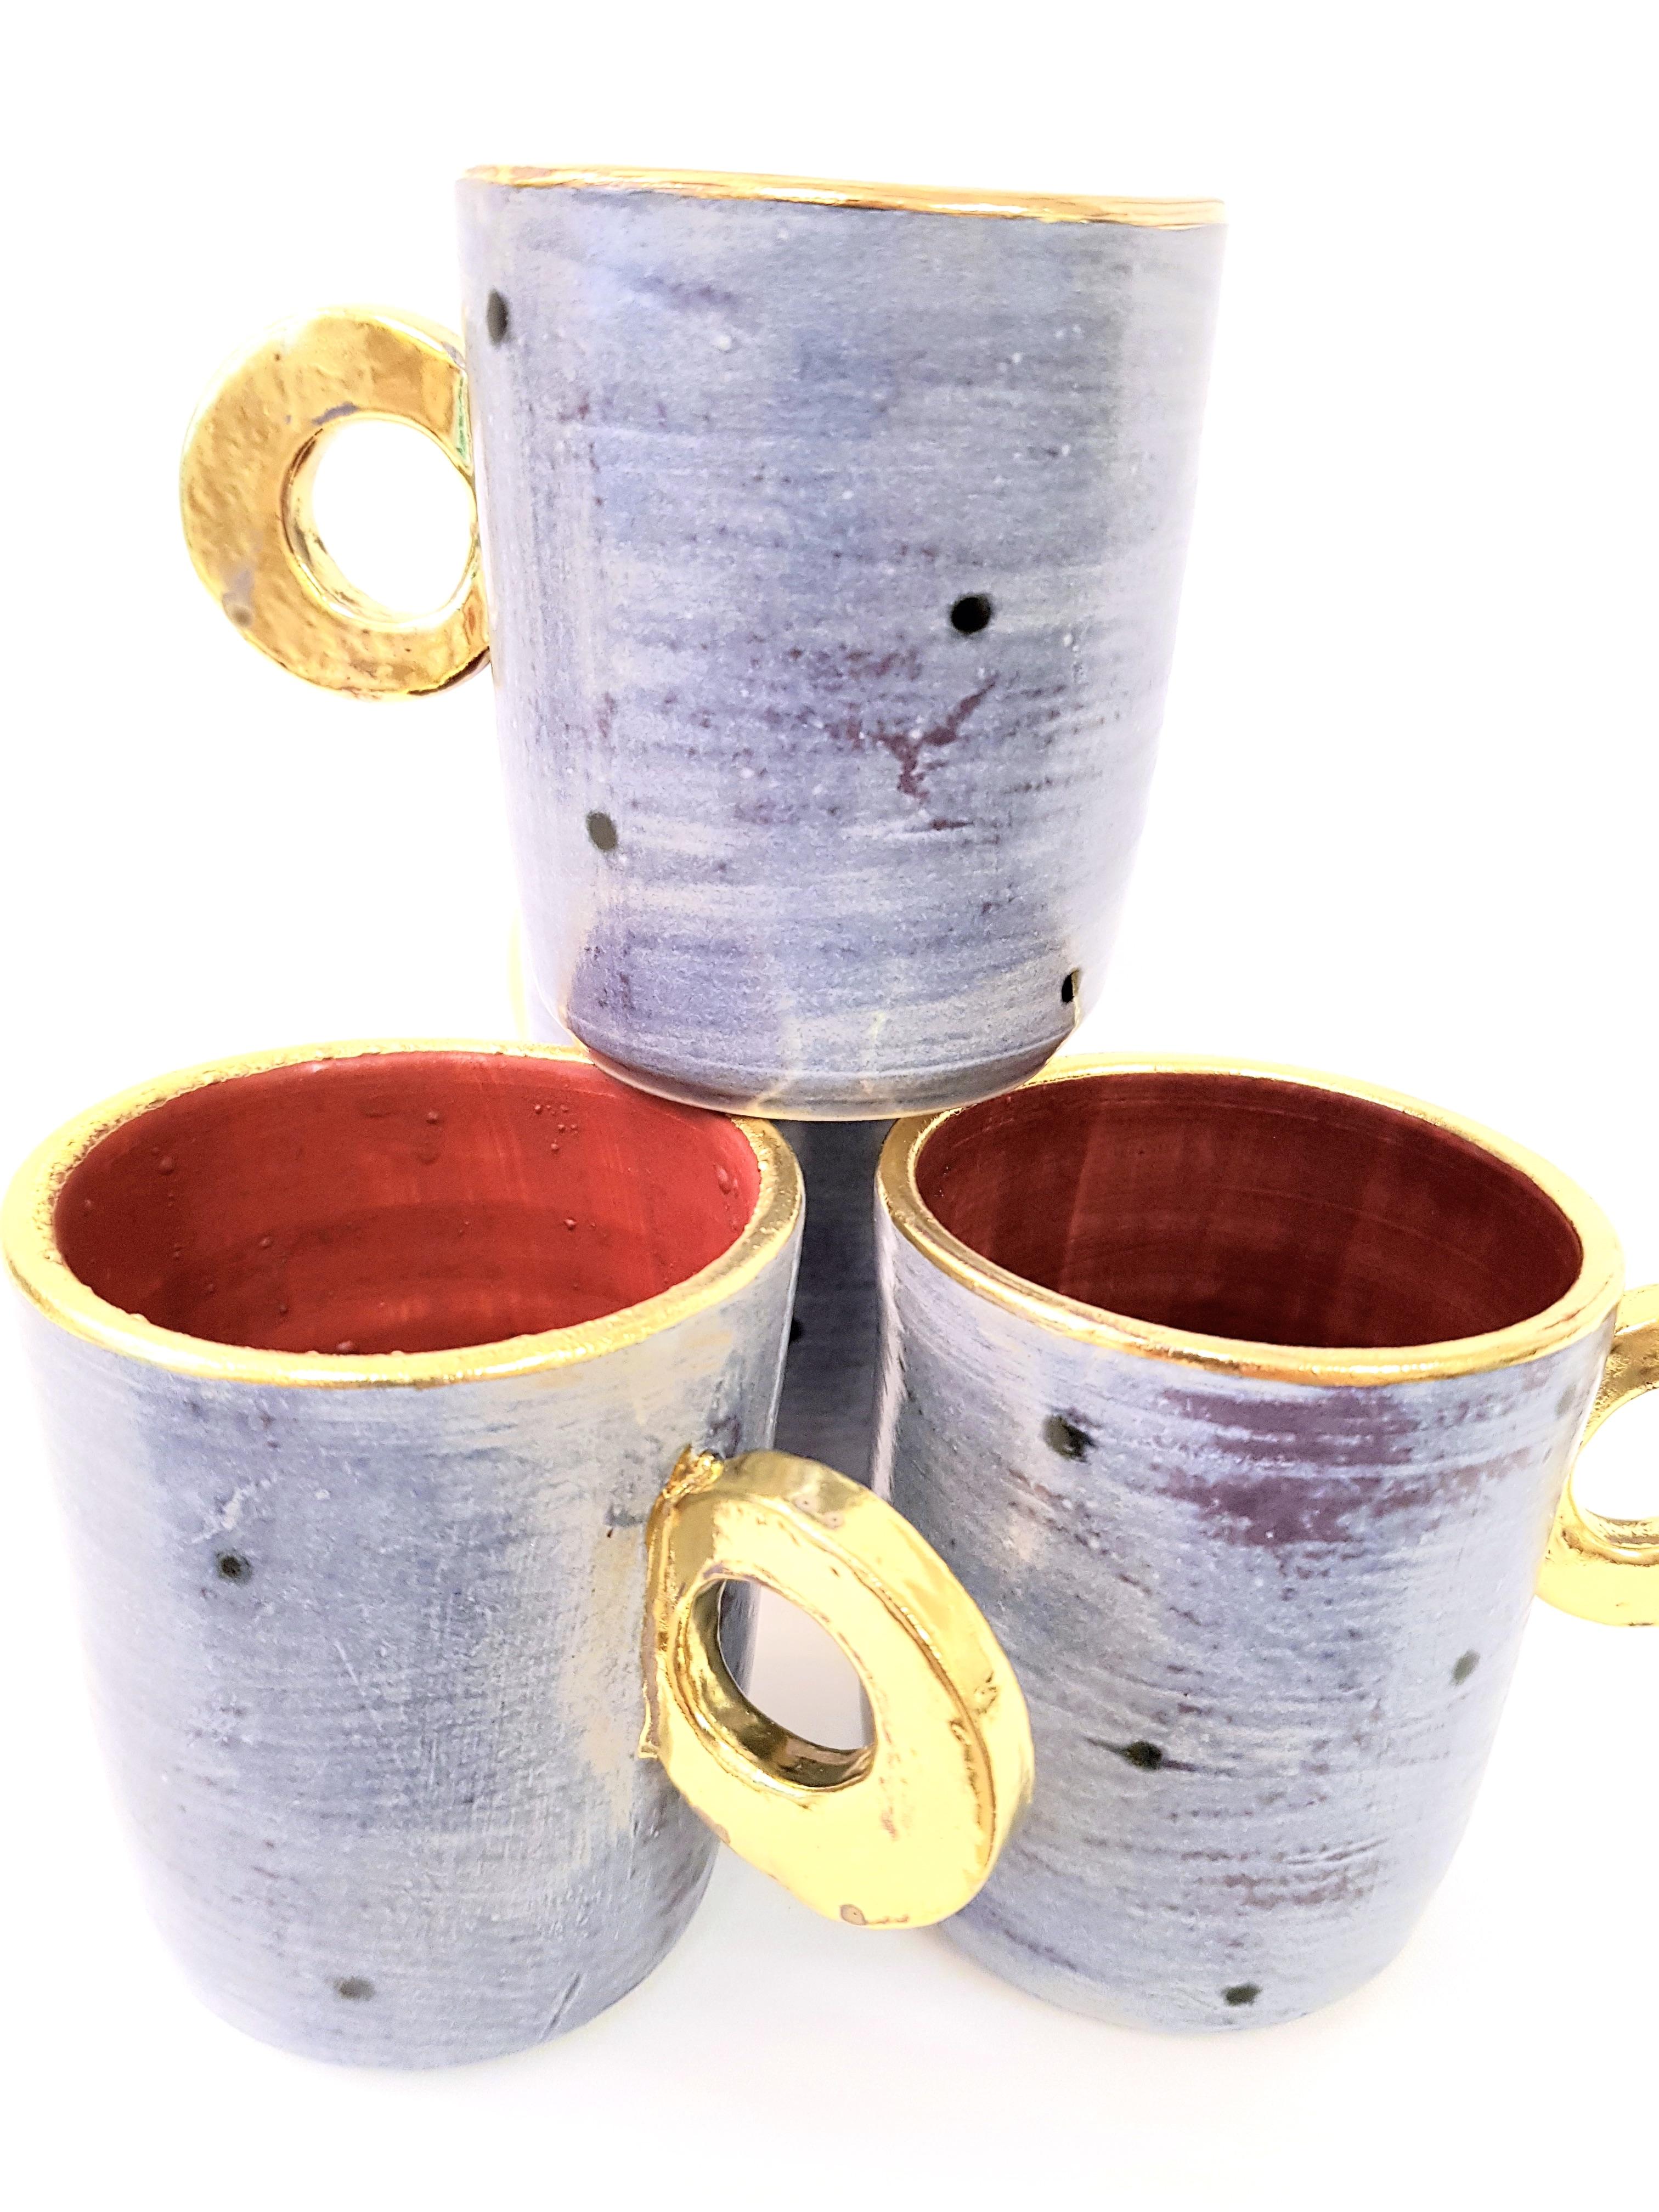 Töpferei la ceramica Basel, Unikat, Töpferkurse, Teamevents, online shop